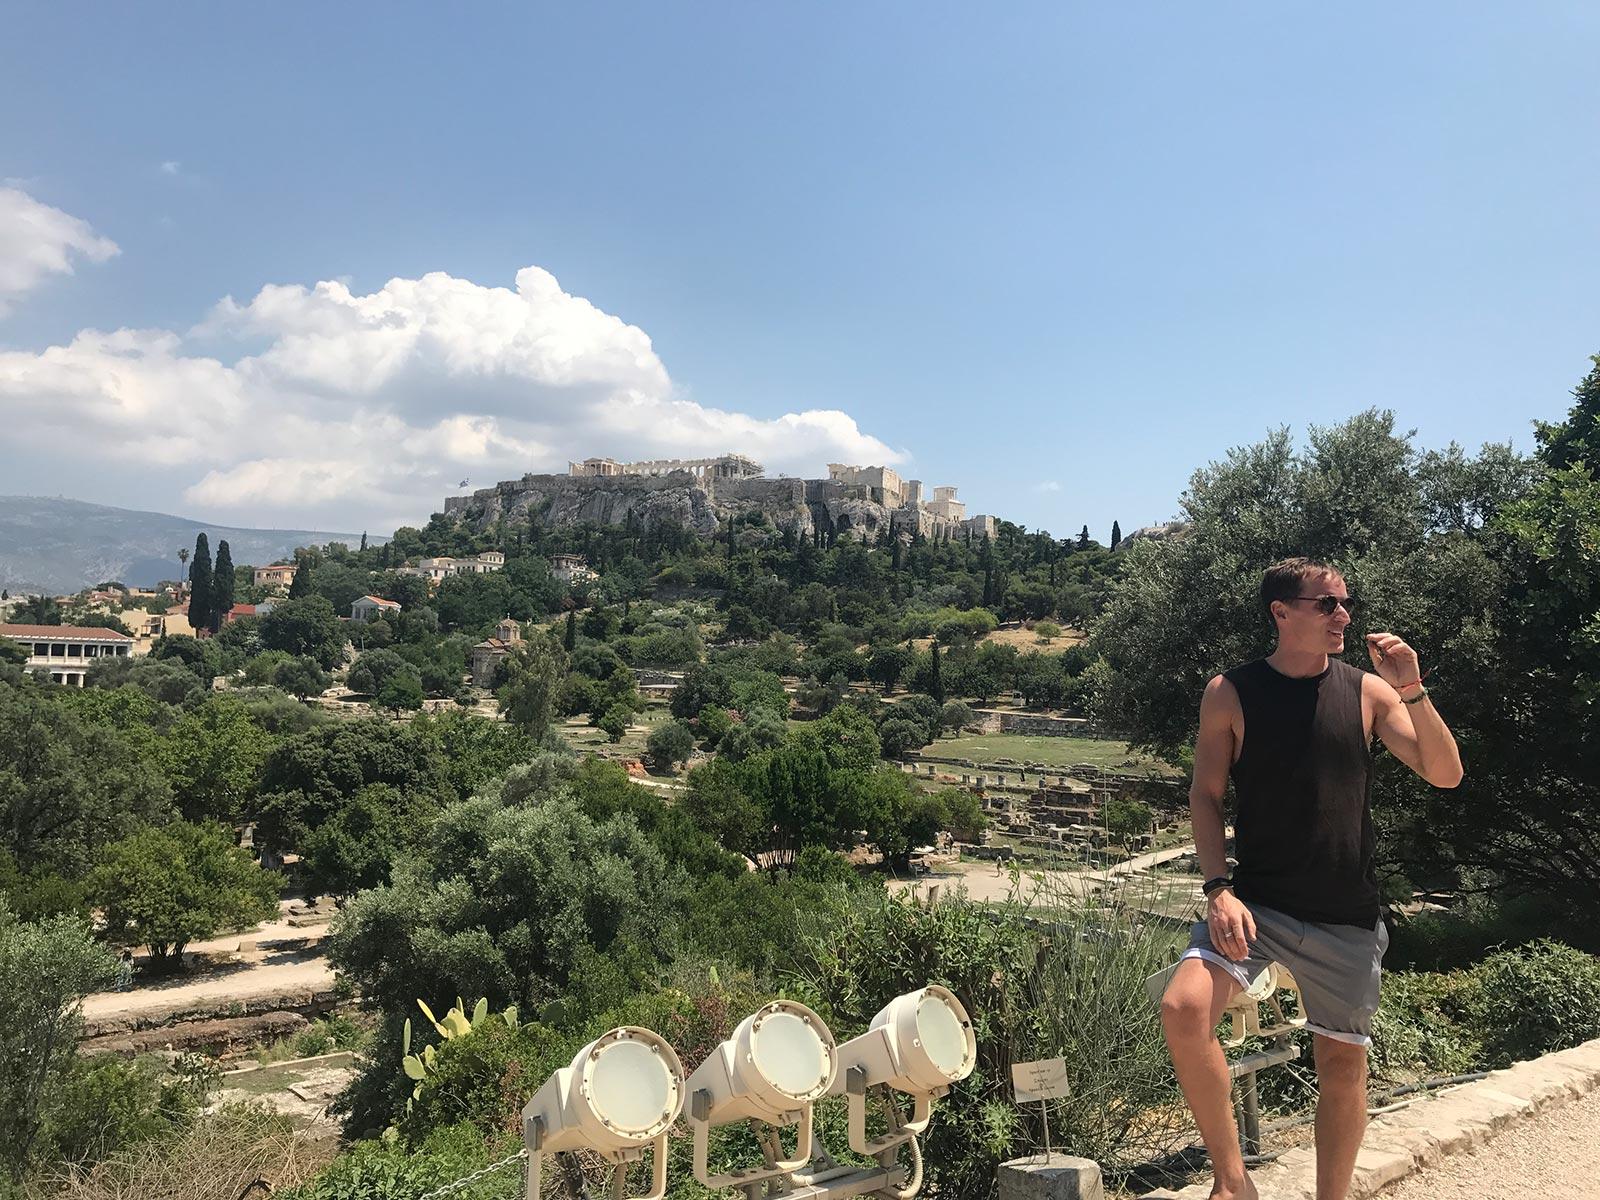 David Simpson at Ancient Agora in Athens, Greece. Athens has me